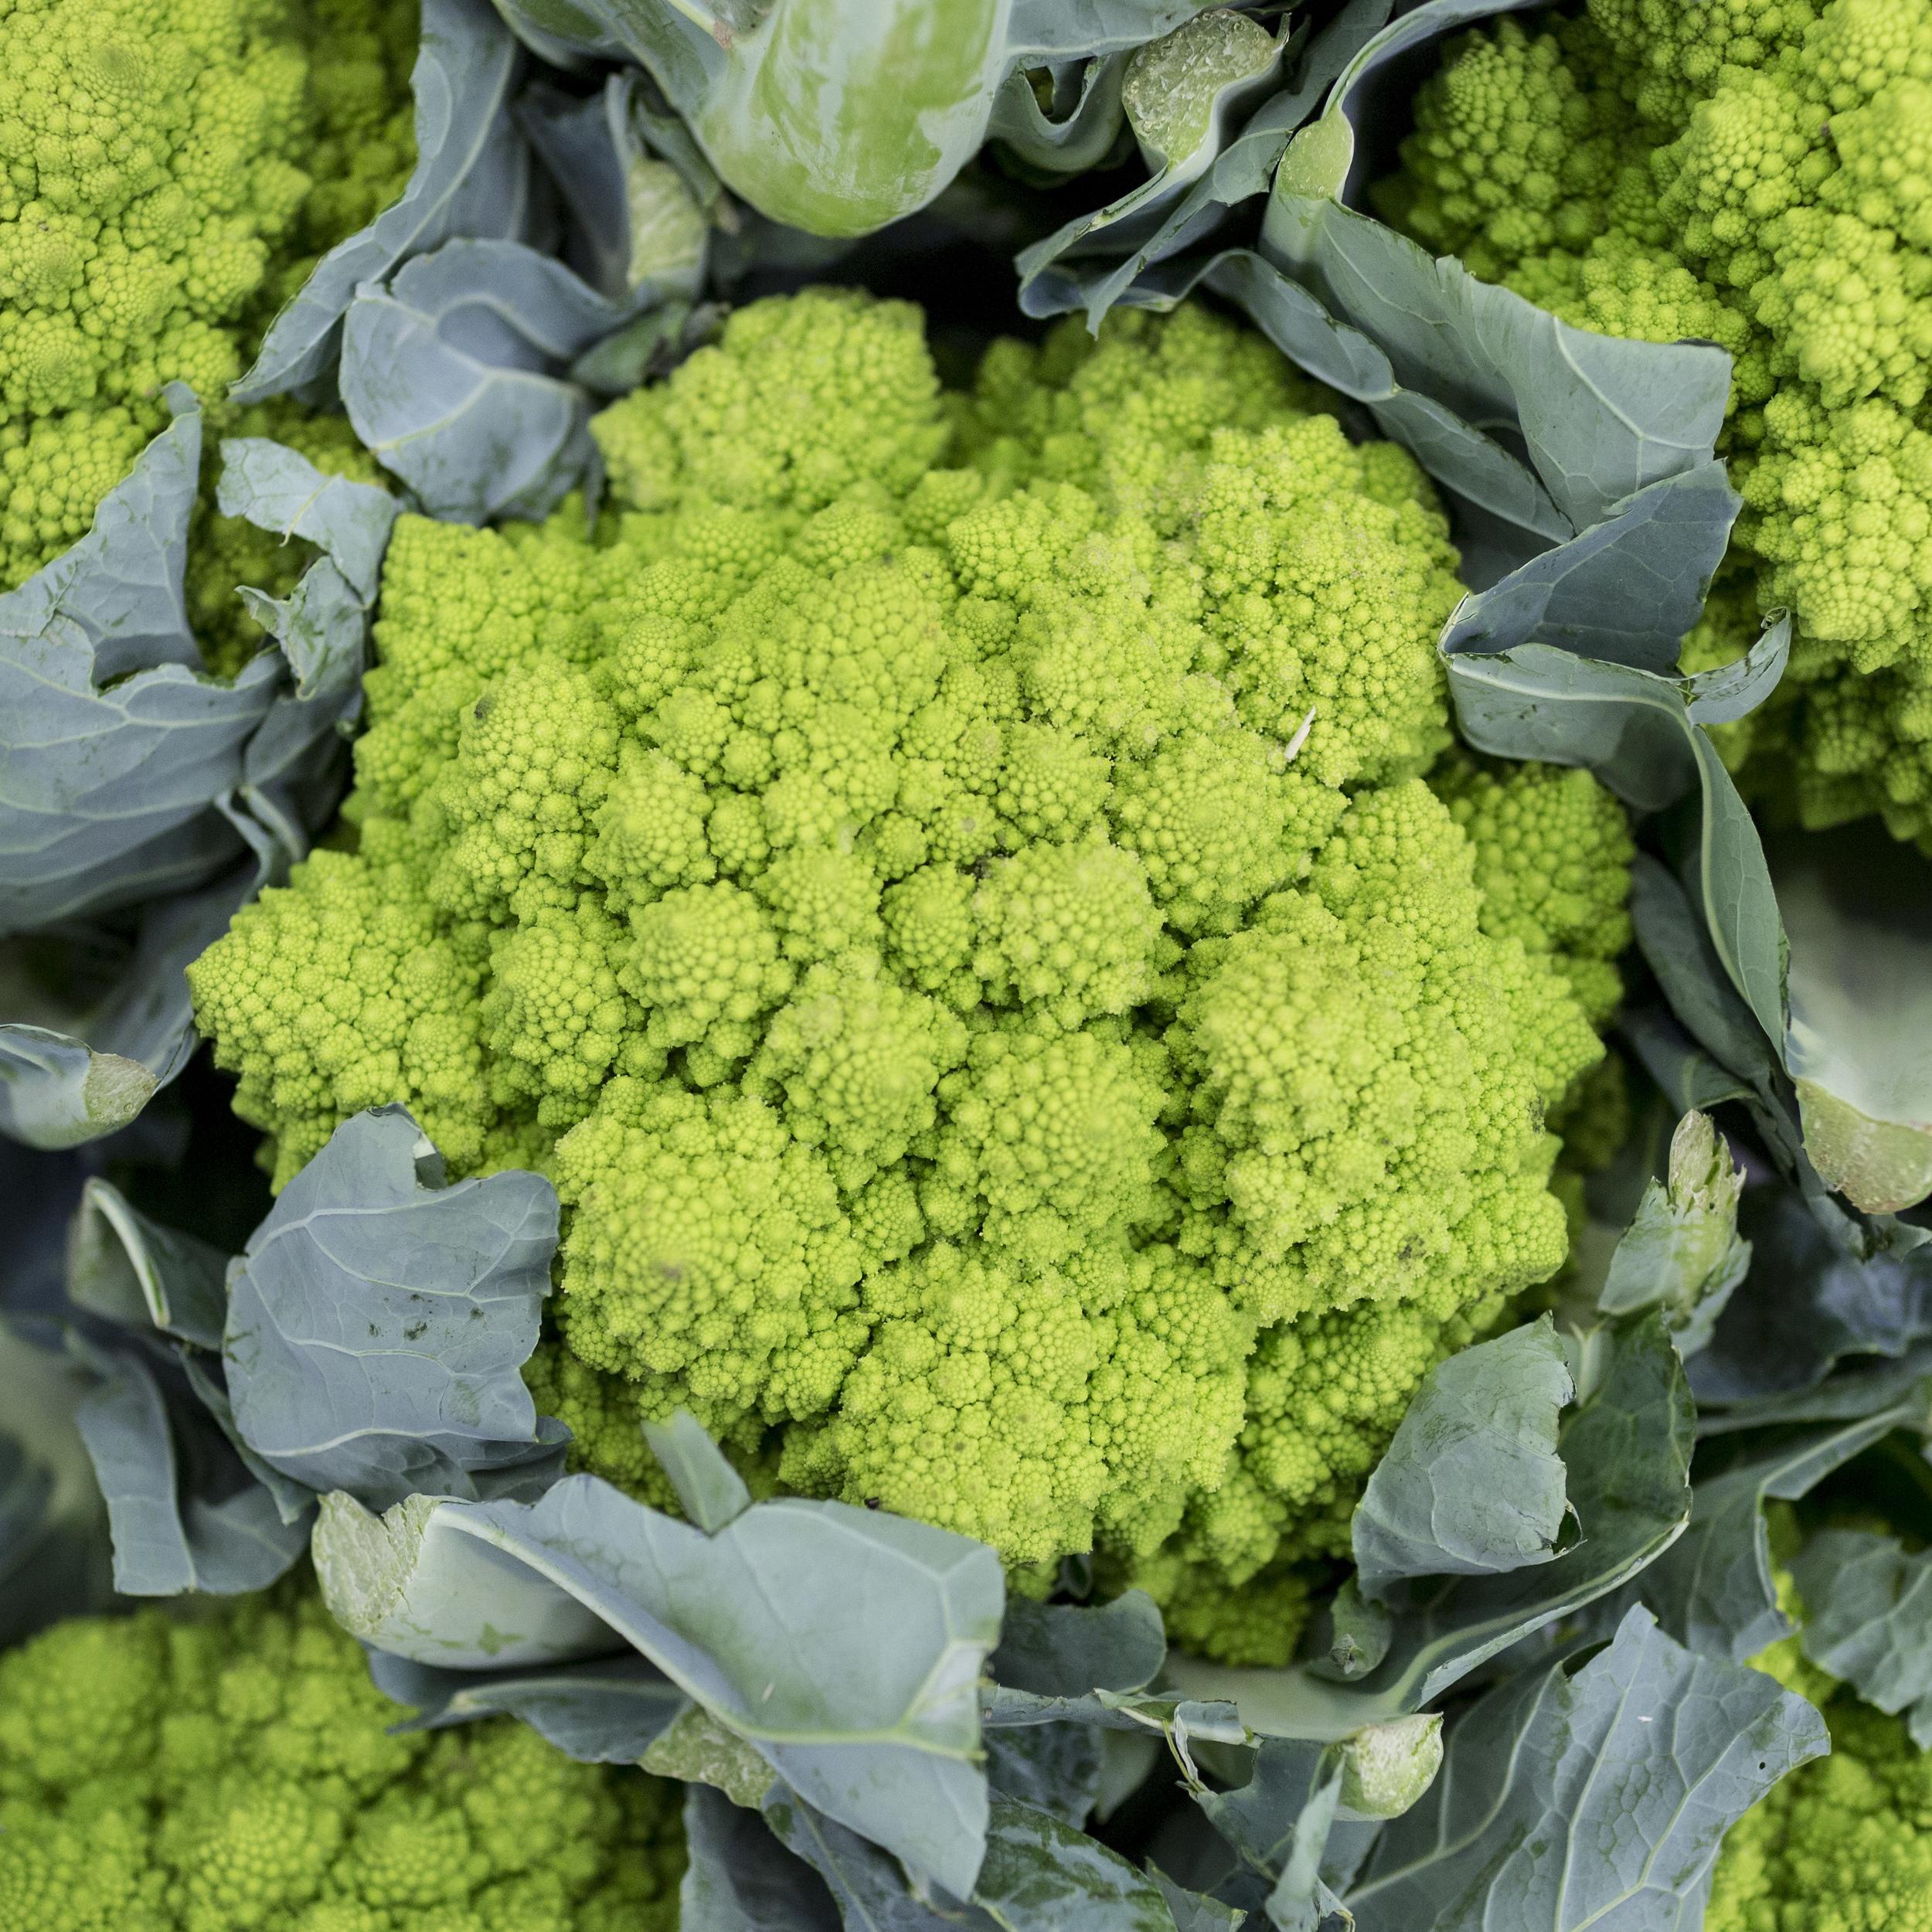 European-Salad-Company-romanesco-cauliflower.jpg